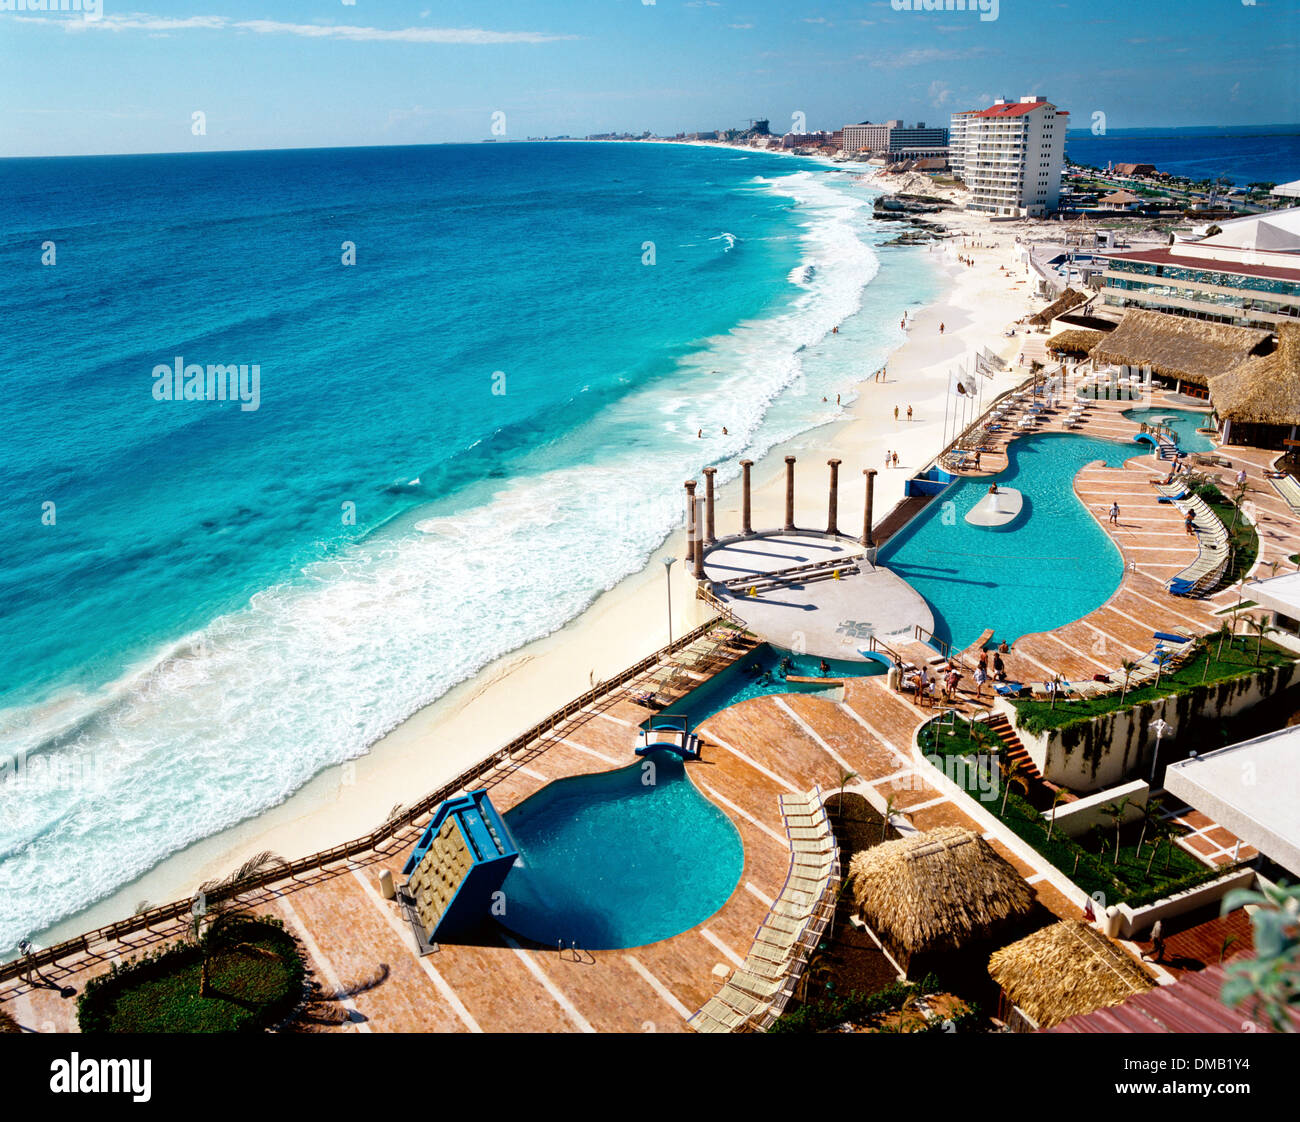 Ansicht des Sheraton Beach Hotel, Ixtapa-Zihuatanejo, Guerrero, Mexiko Stockbild